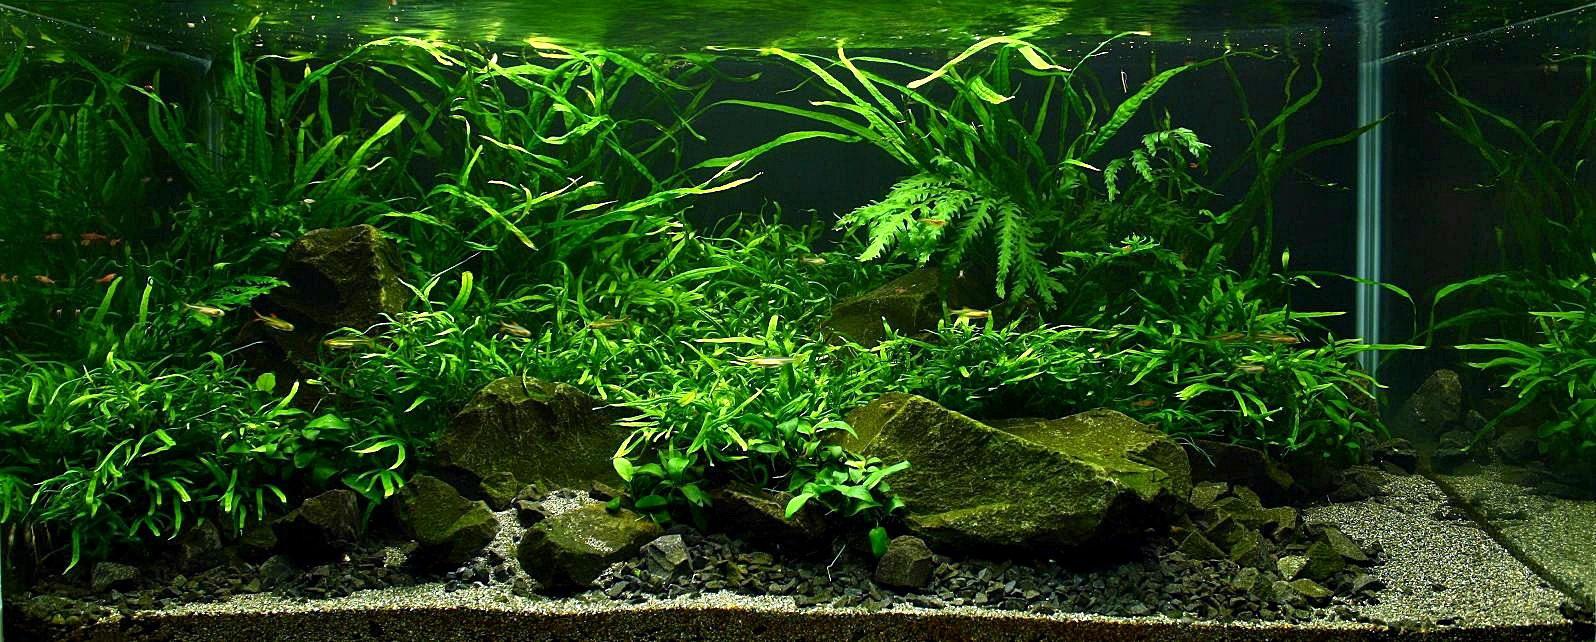 Vladimir fitz and aquascaping aqua rebell for Plante aquarium